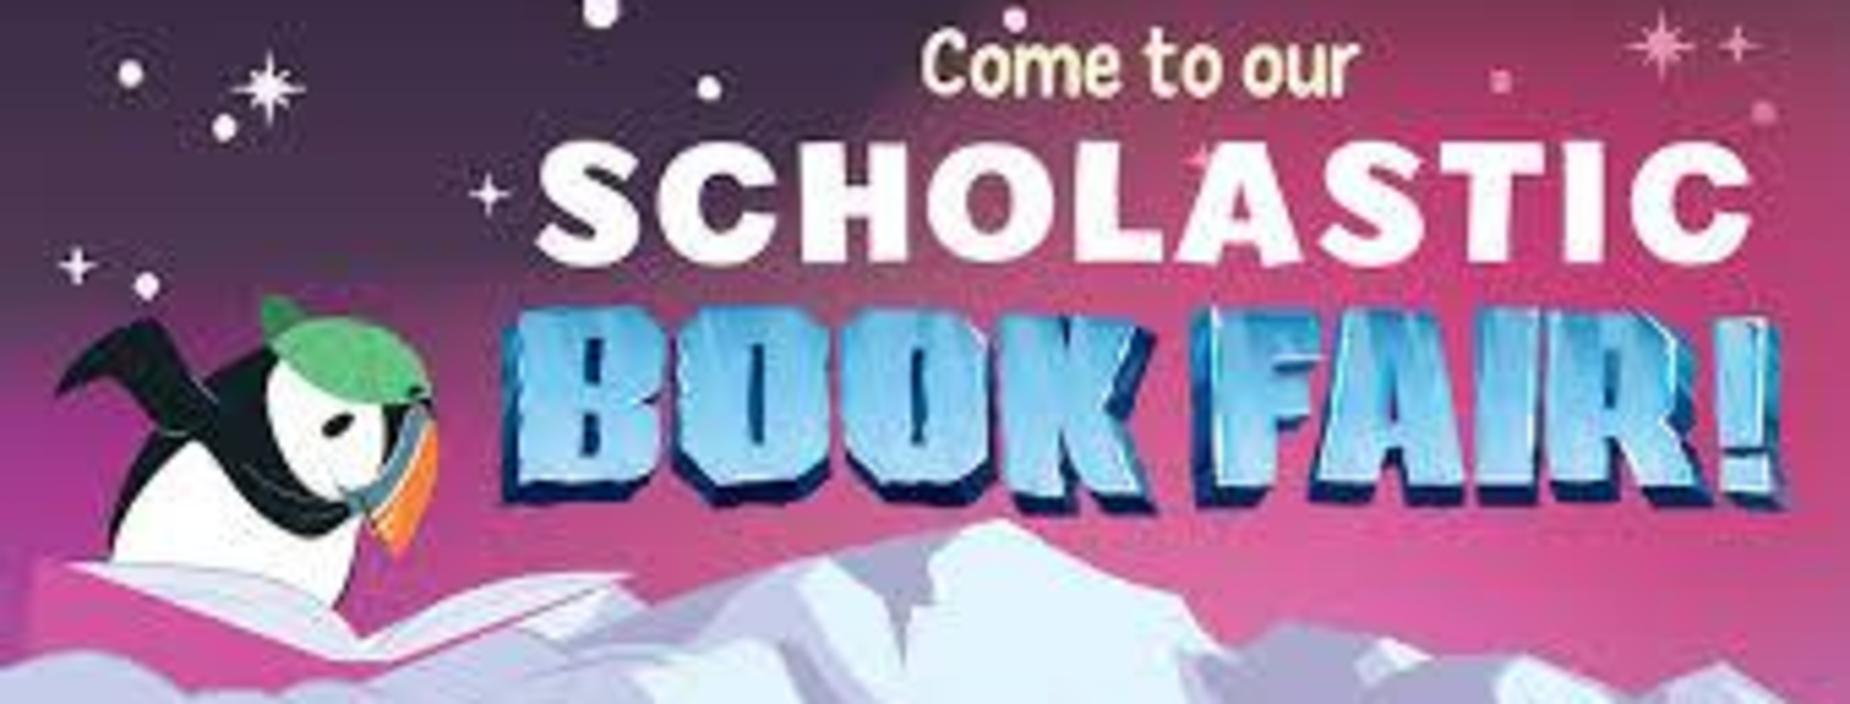 Banner for Scholastic Book Fair